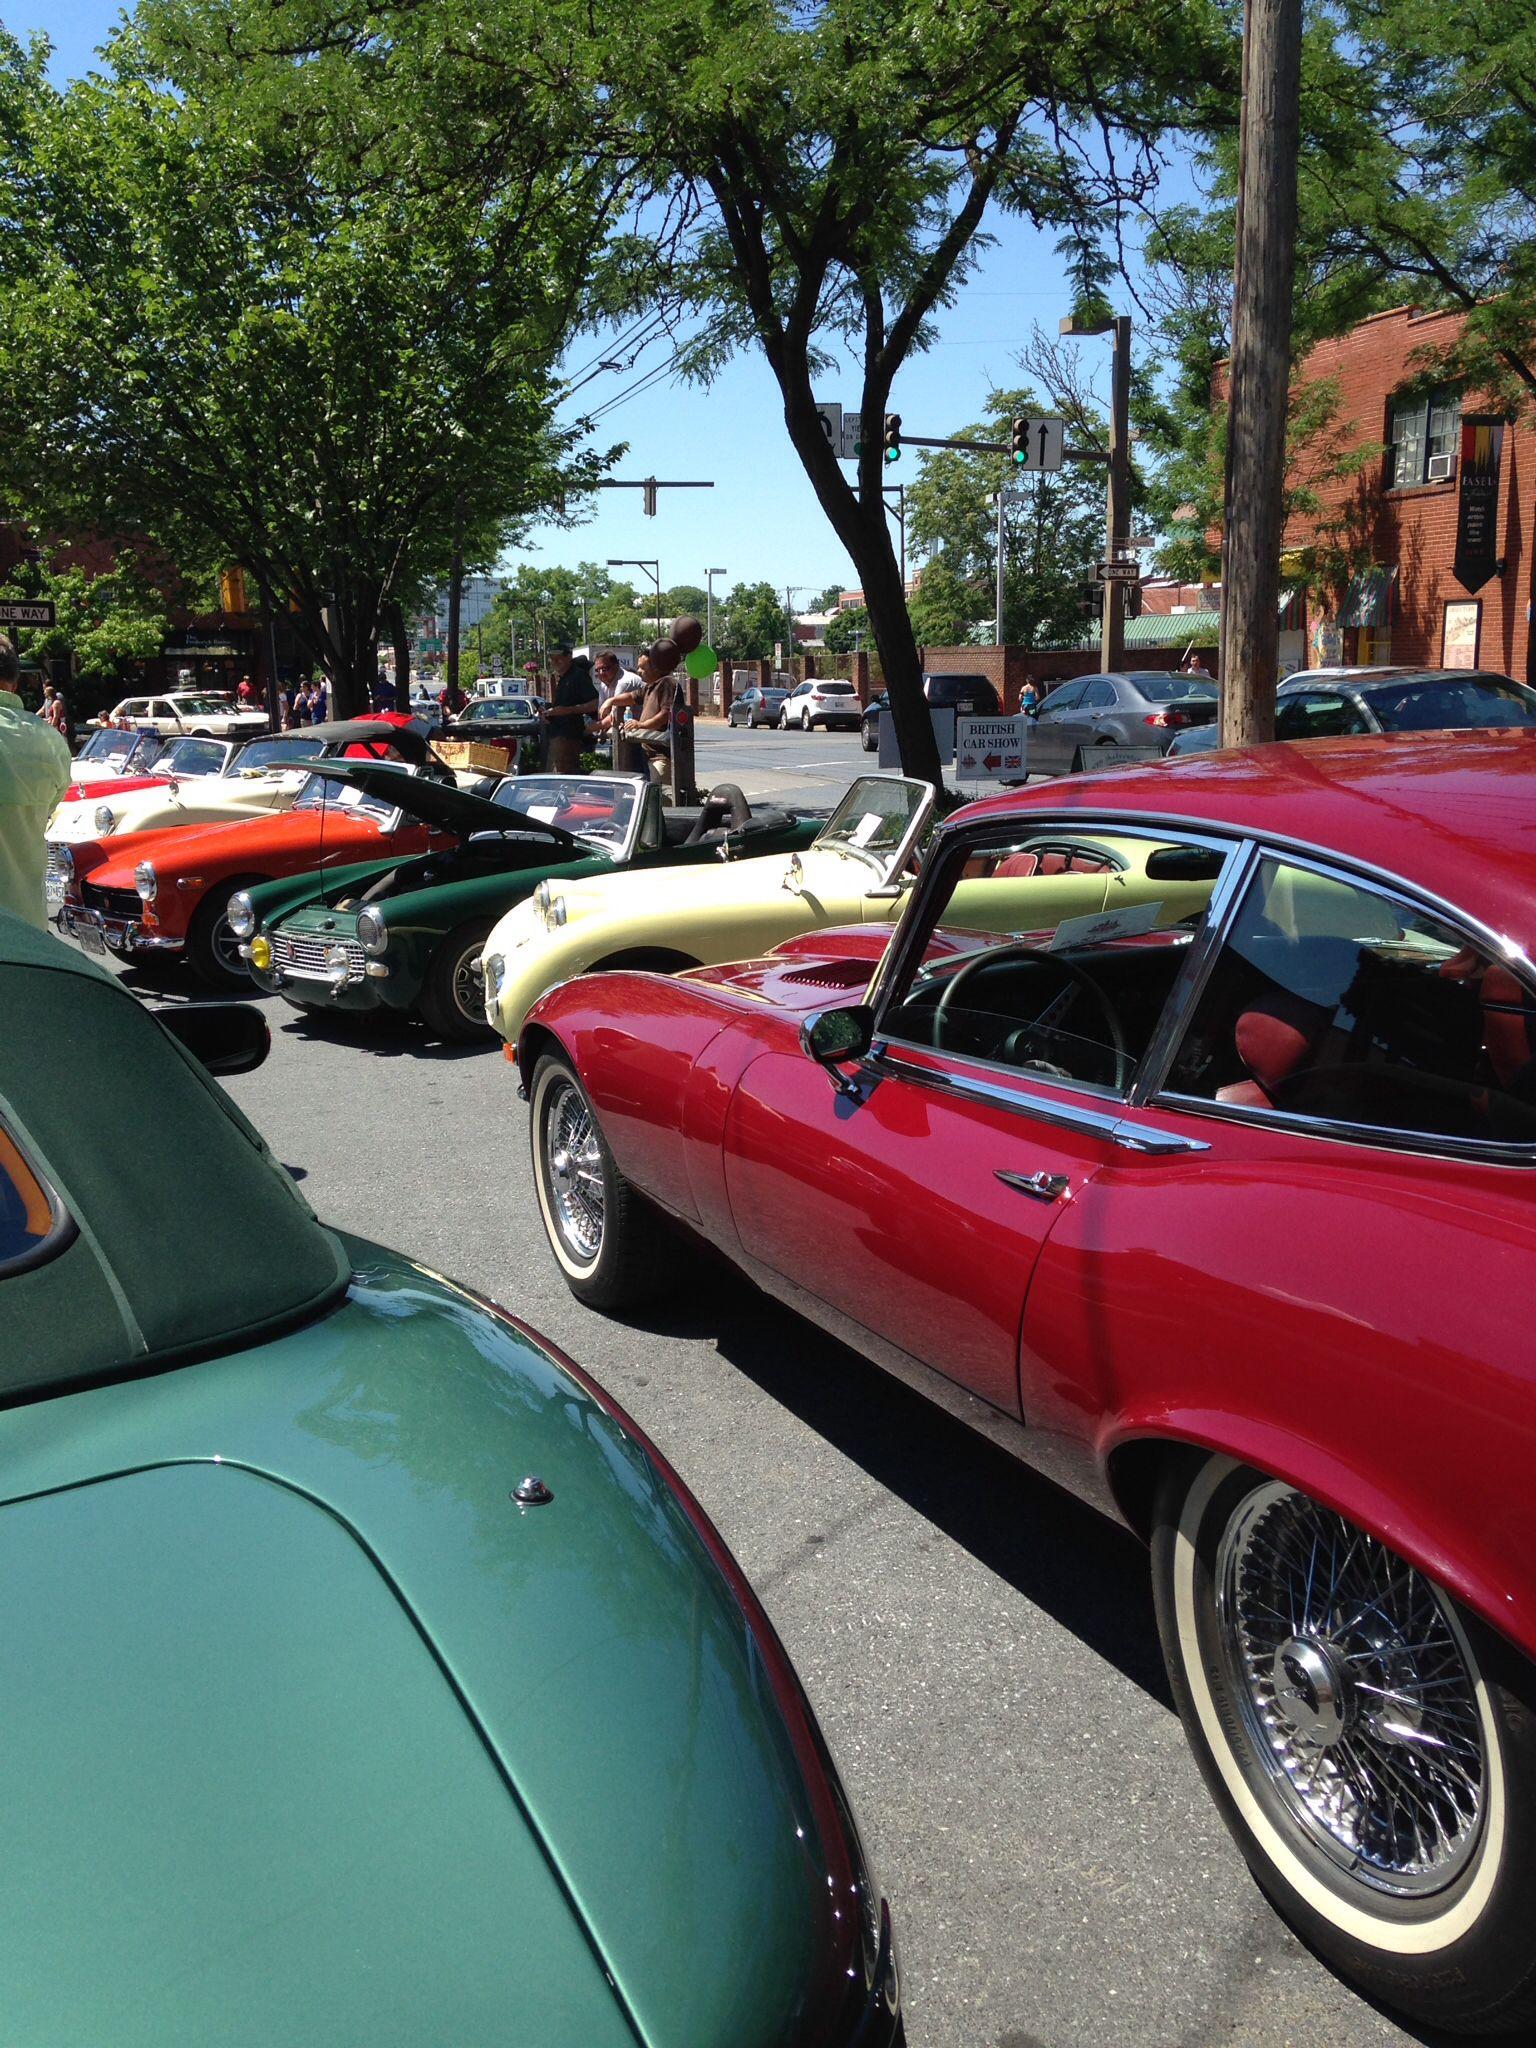 Everedy Square June 7, 2014 in Frederick, MD!